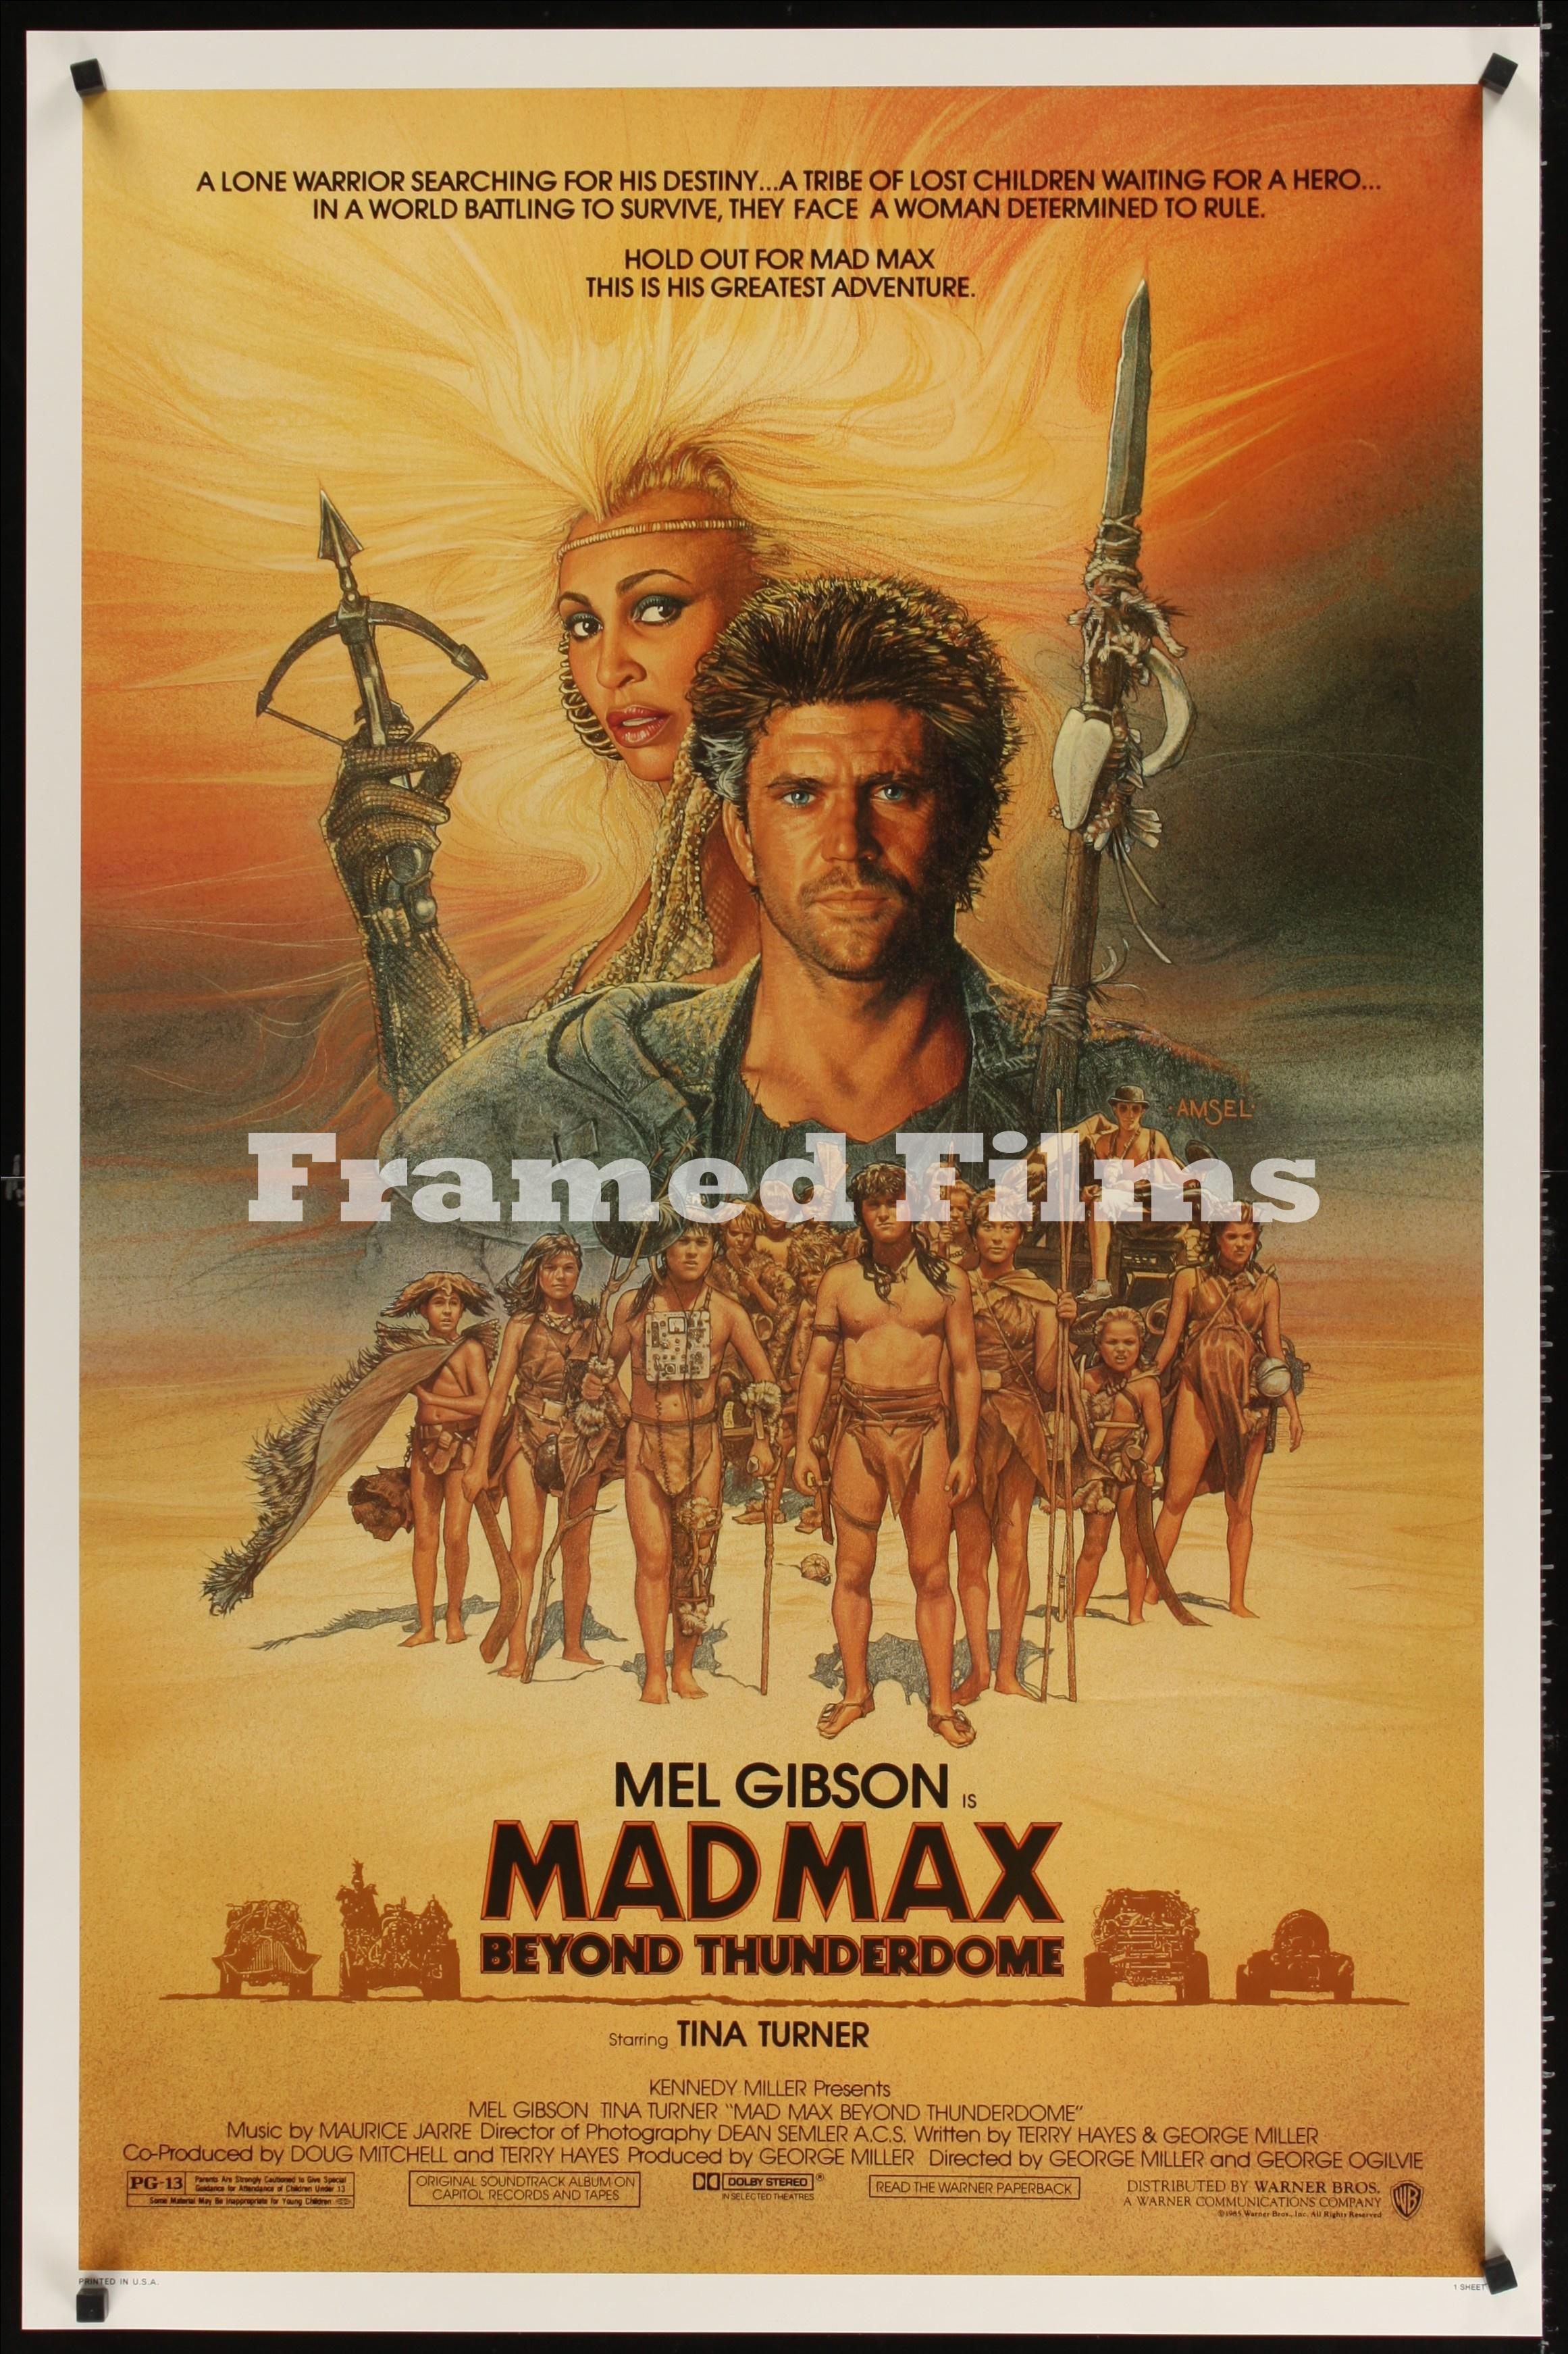 mad_max_beyond_thunderdome_JC02165_L.jpg